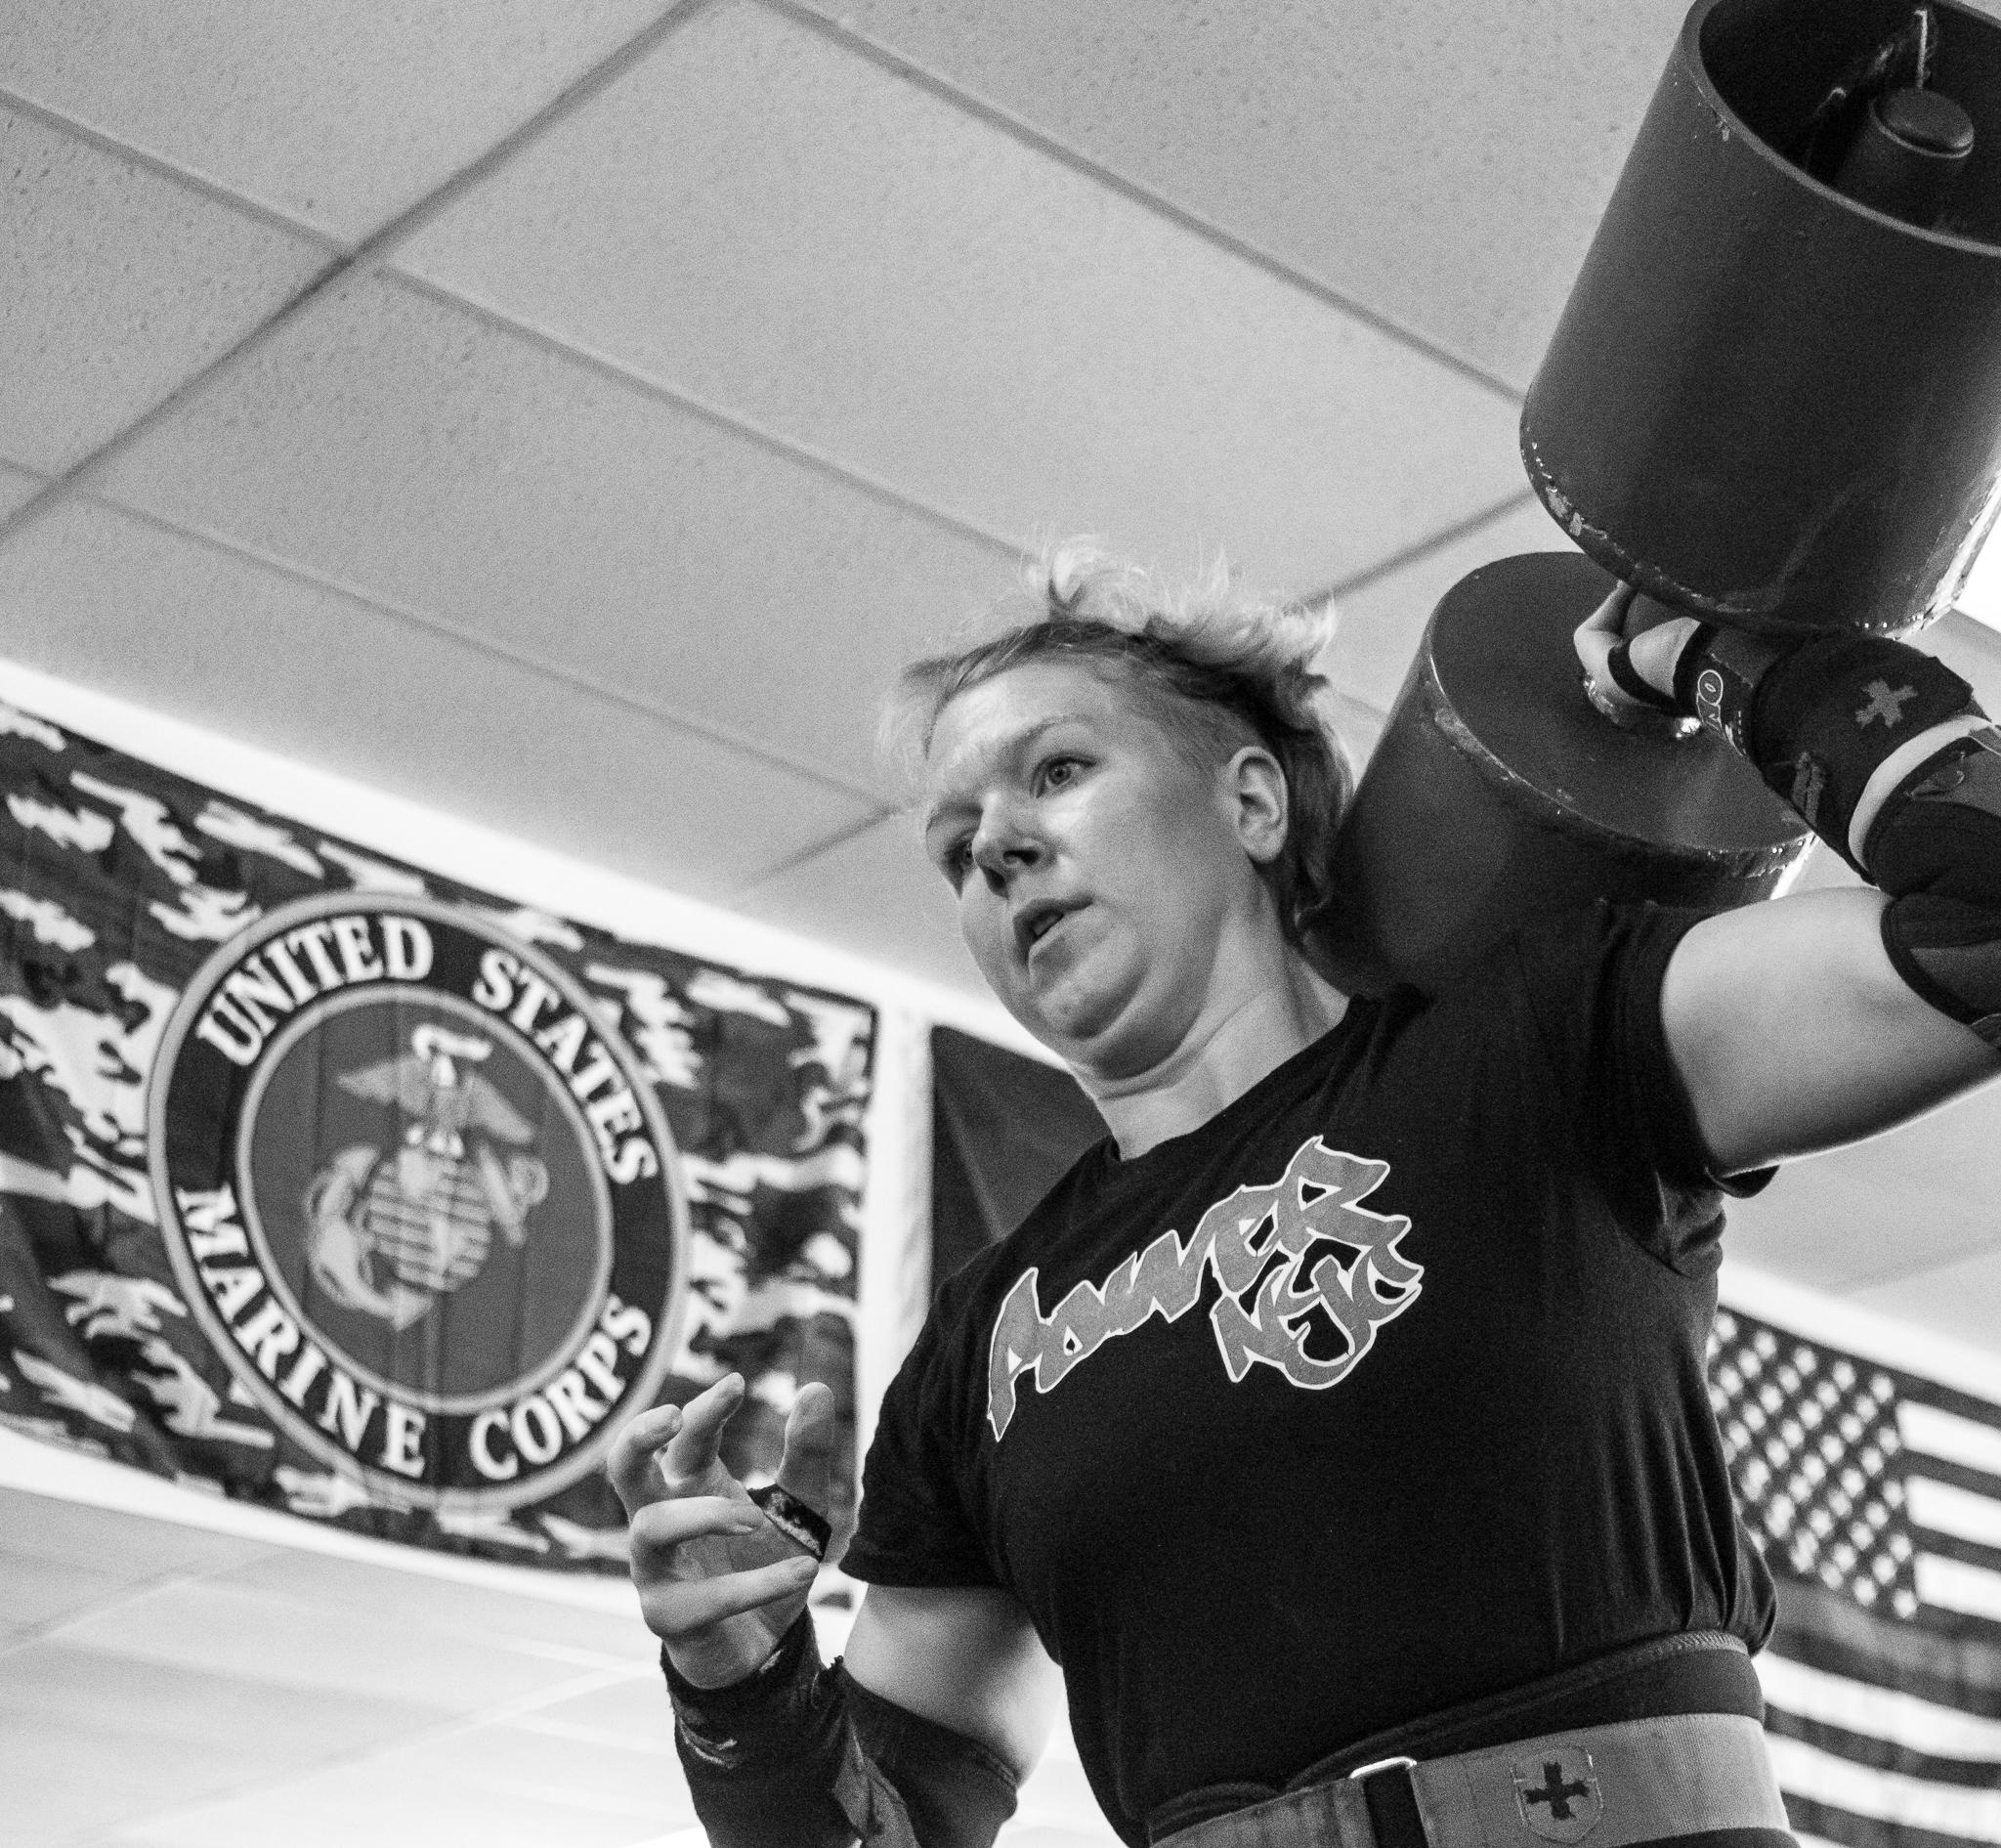 hurt-performance-4th-annual-little-viking-charity-washingtonville-new-york-strongman-eveyrdaylifters-vp (192 of 348).jpg